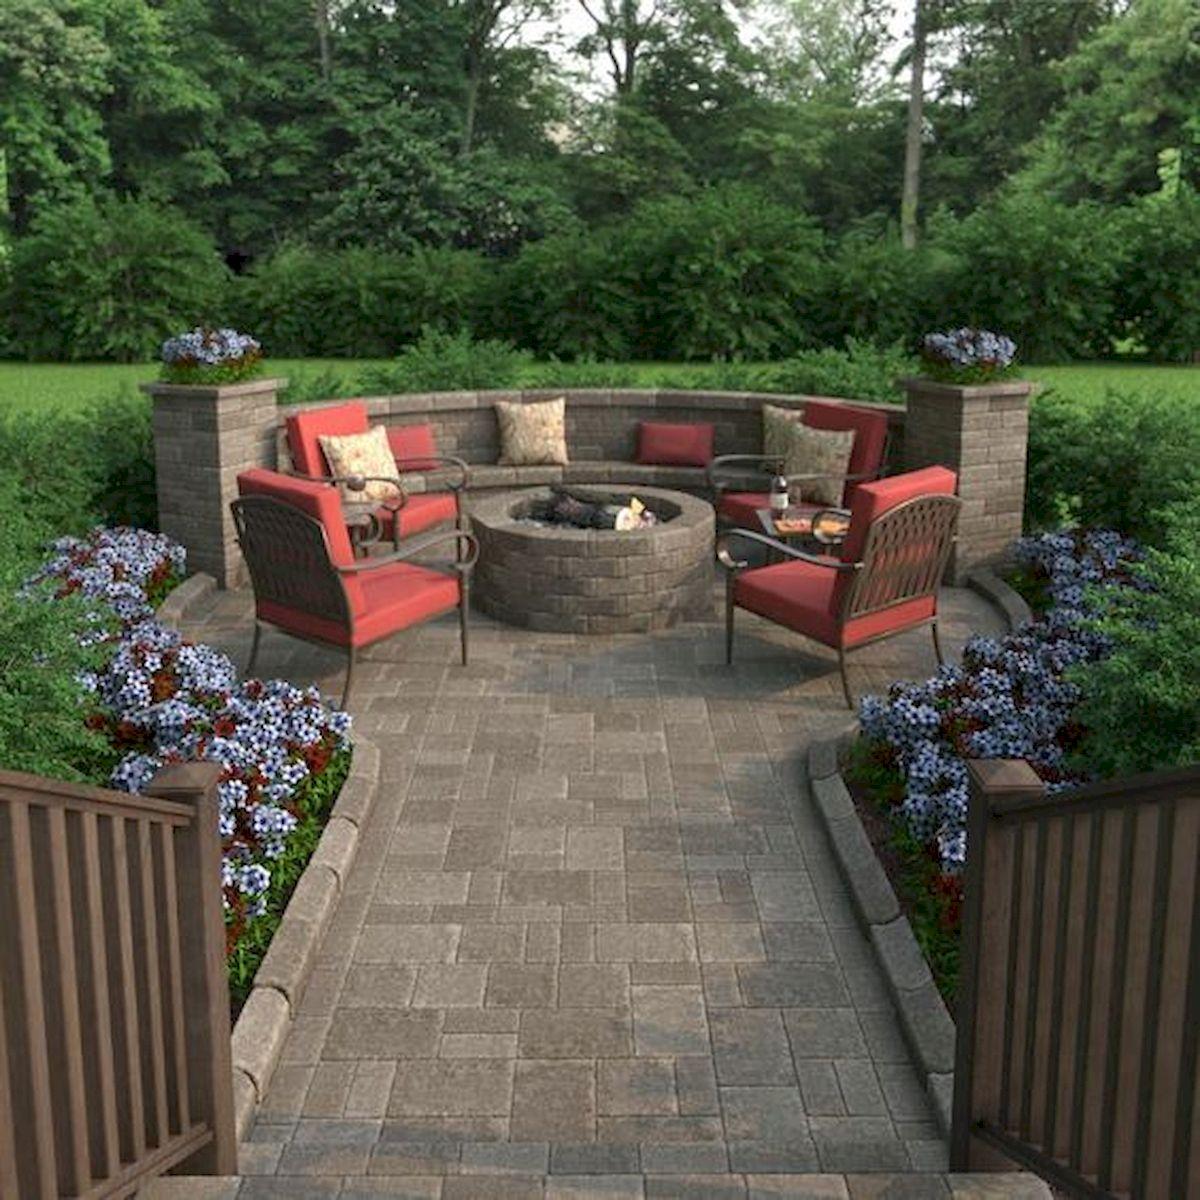 50 Best DIY Backyard Patio and Decking Design Ideas (28)